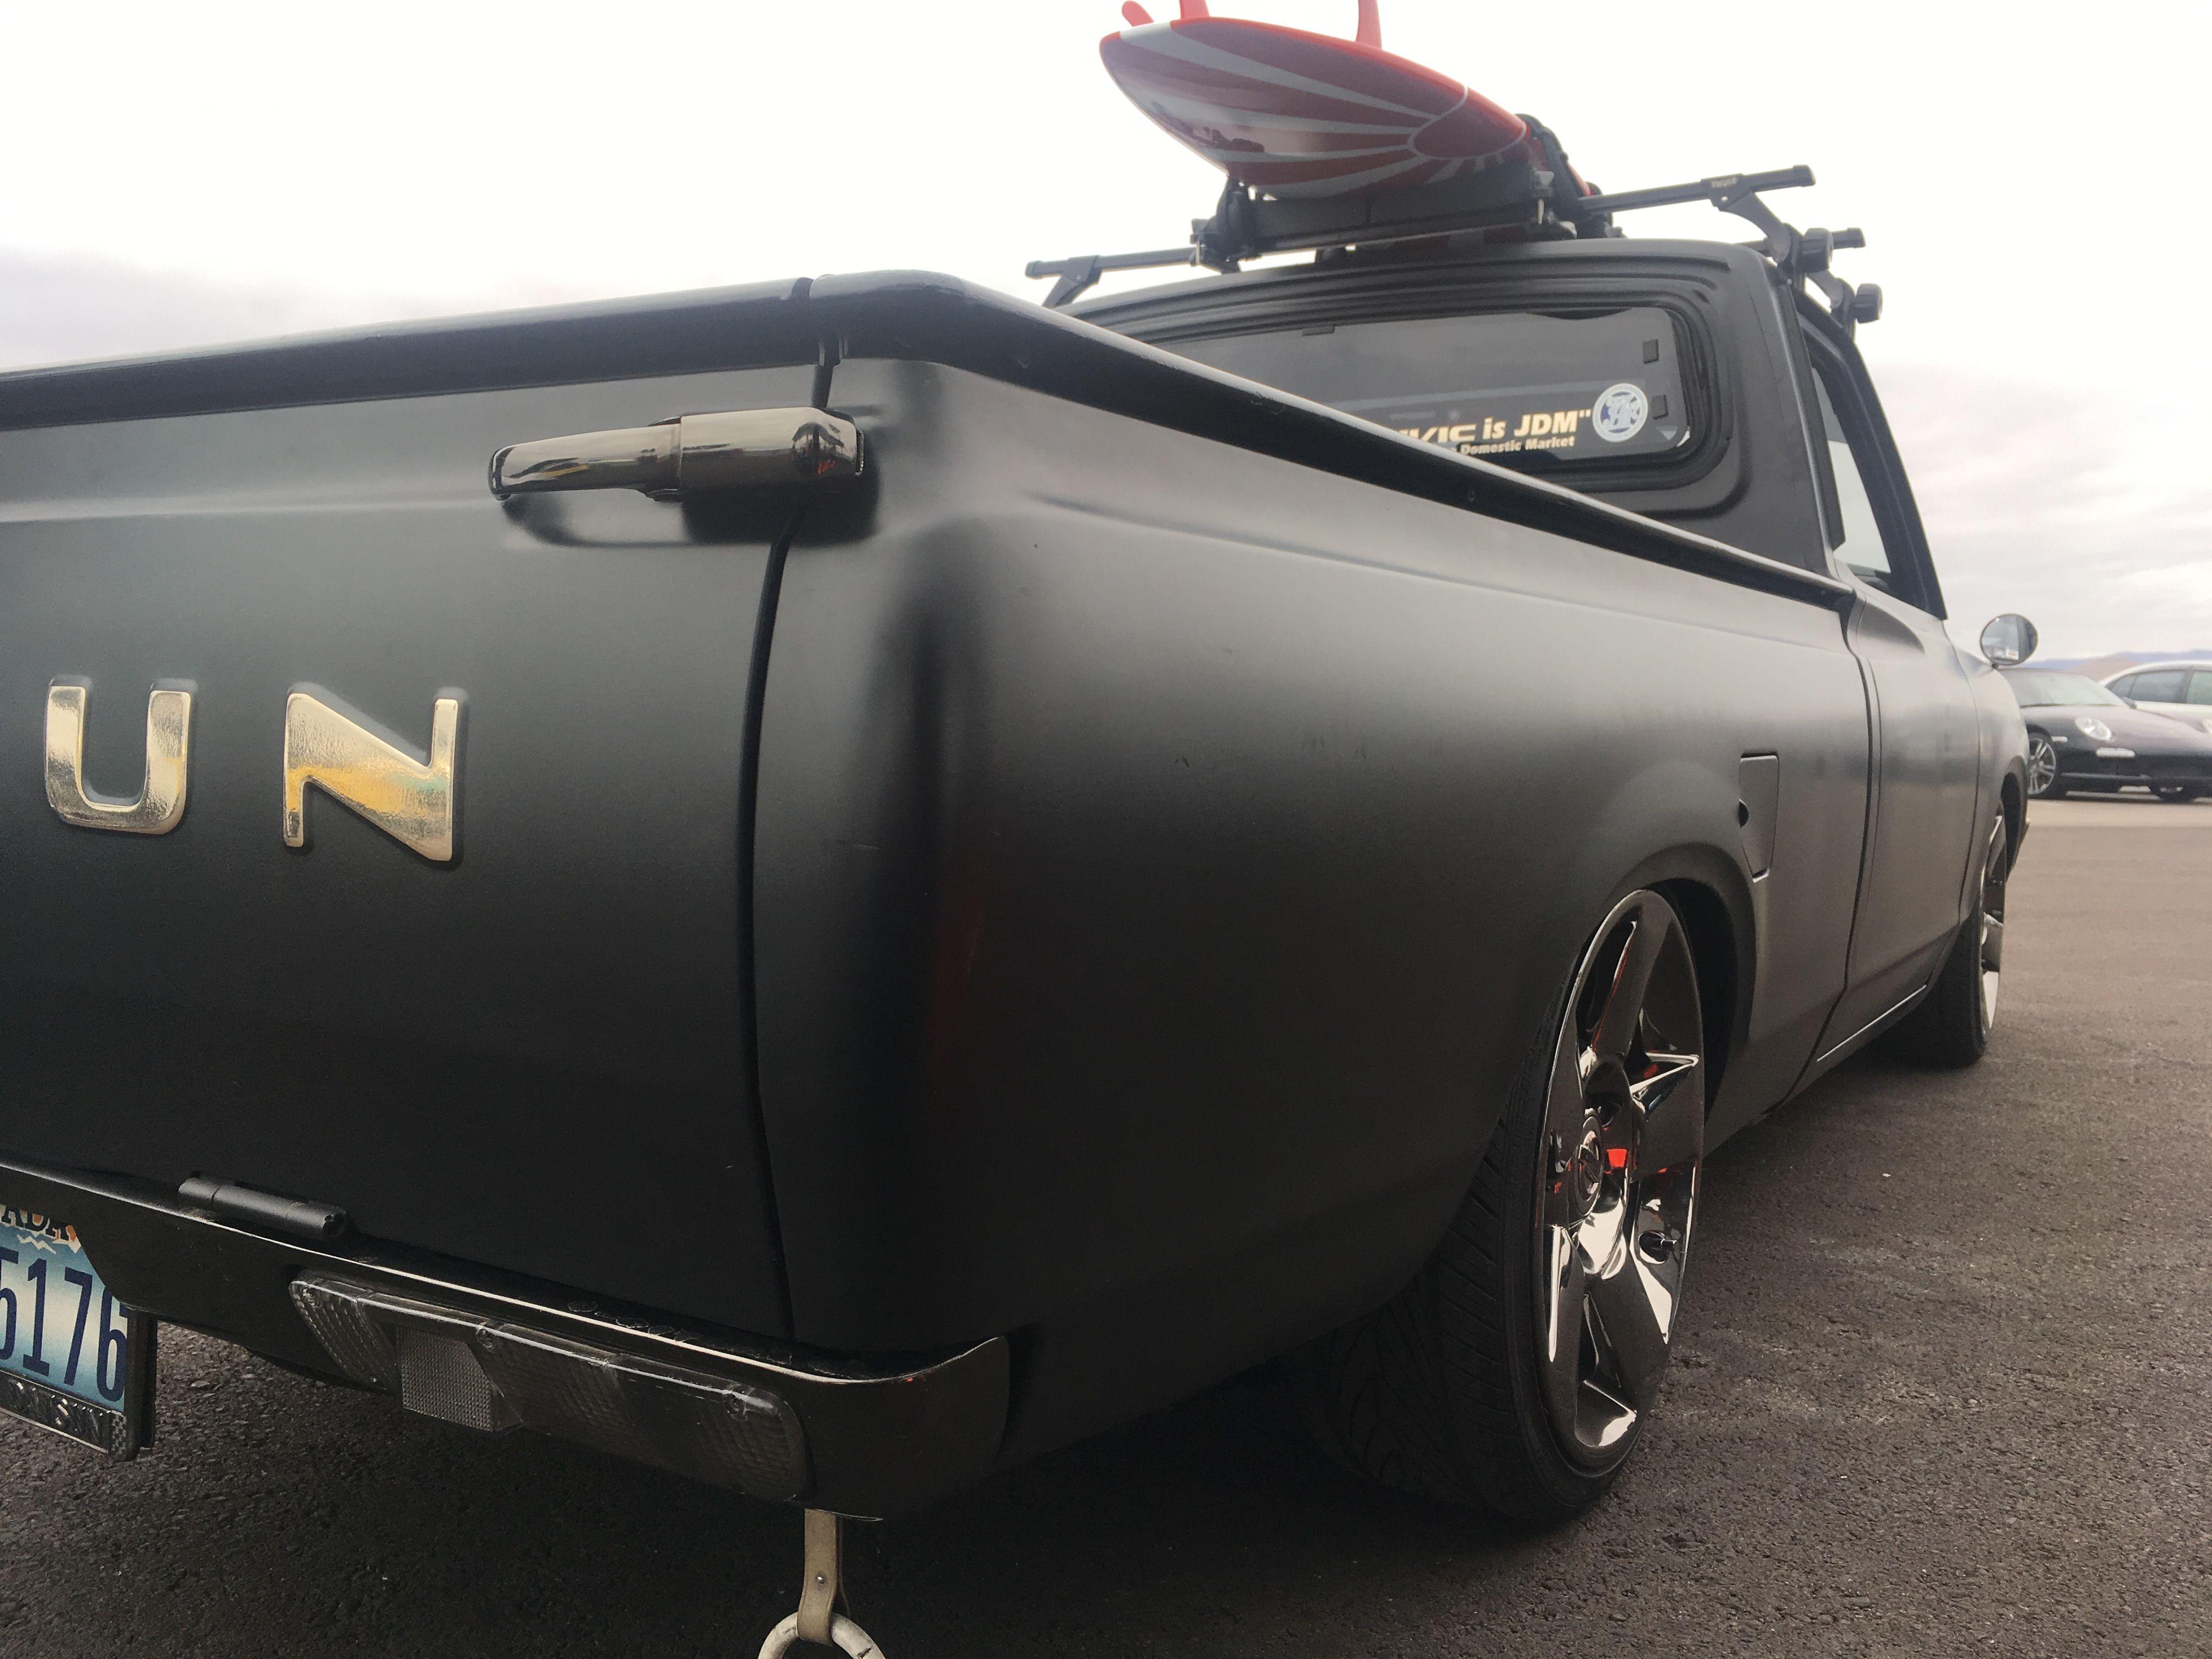 Nissan datsun 510 truck - Datsun